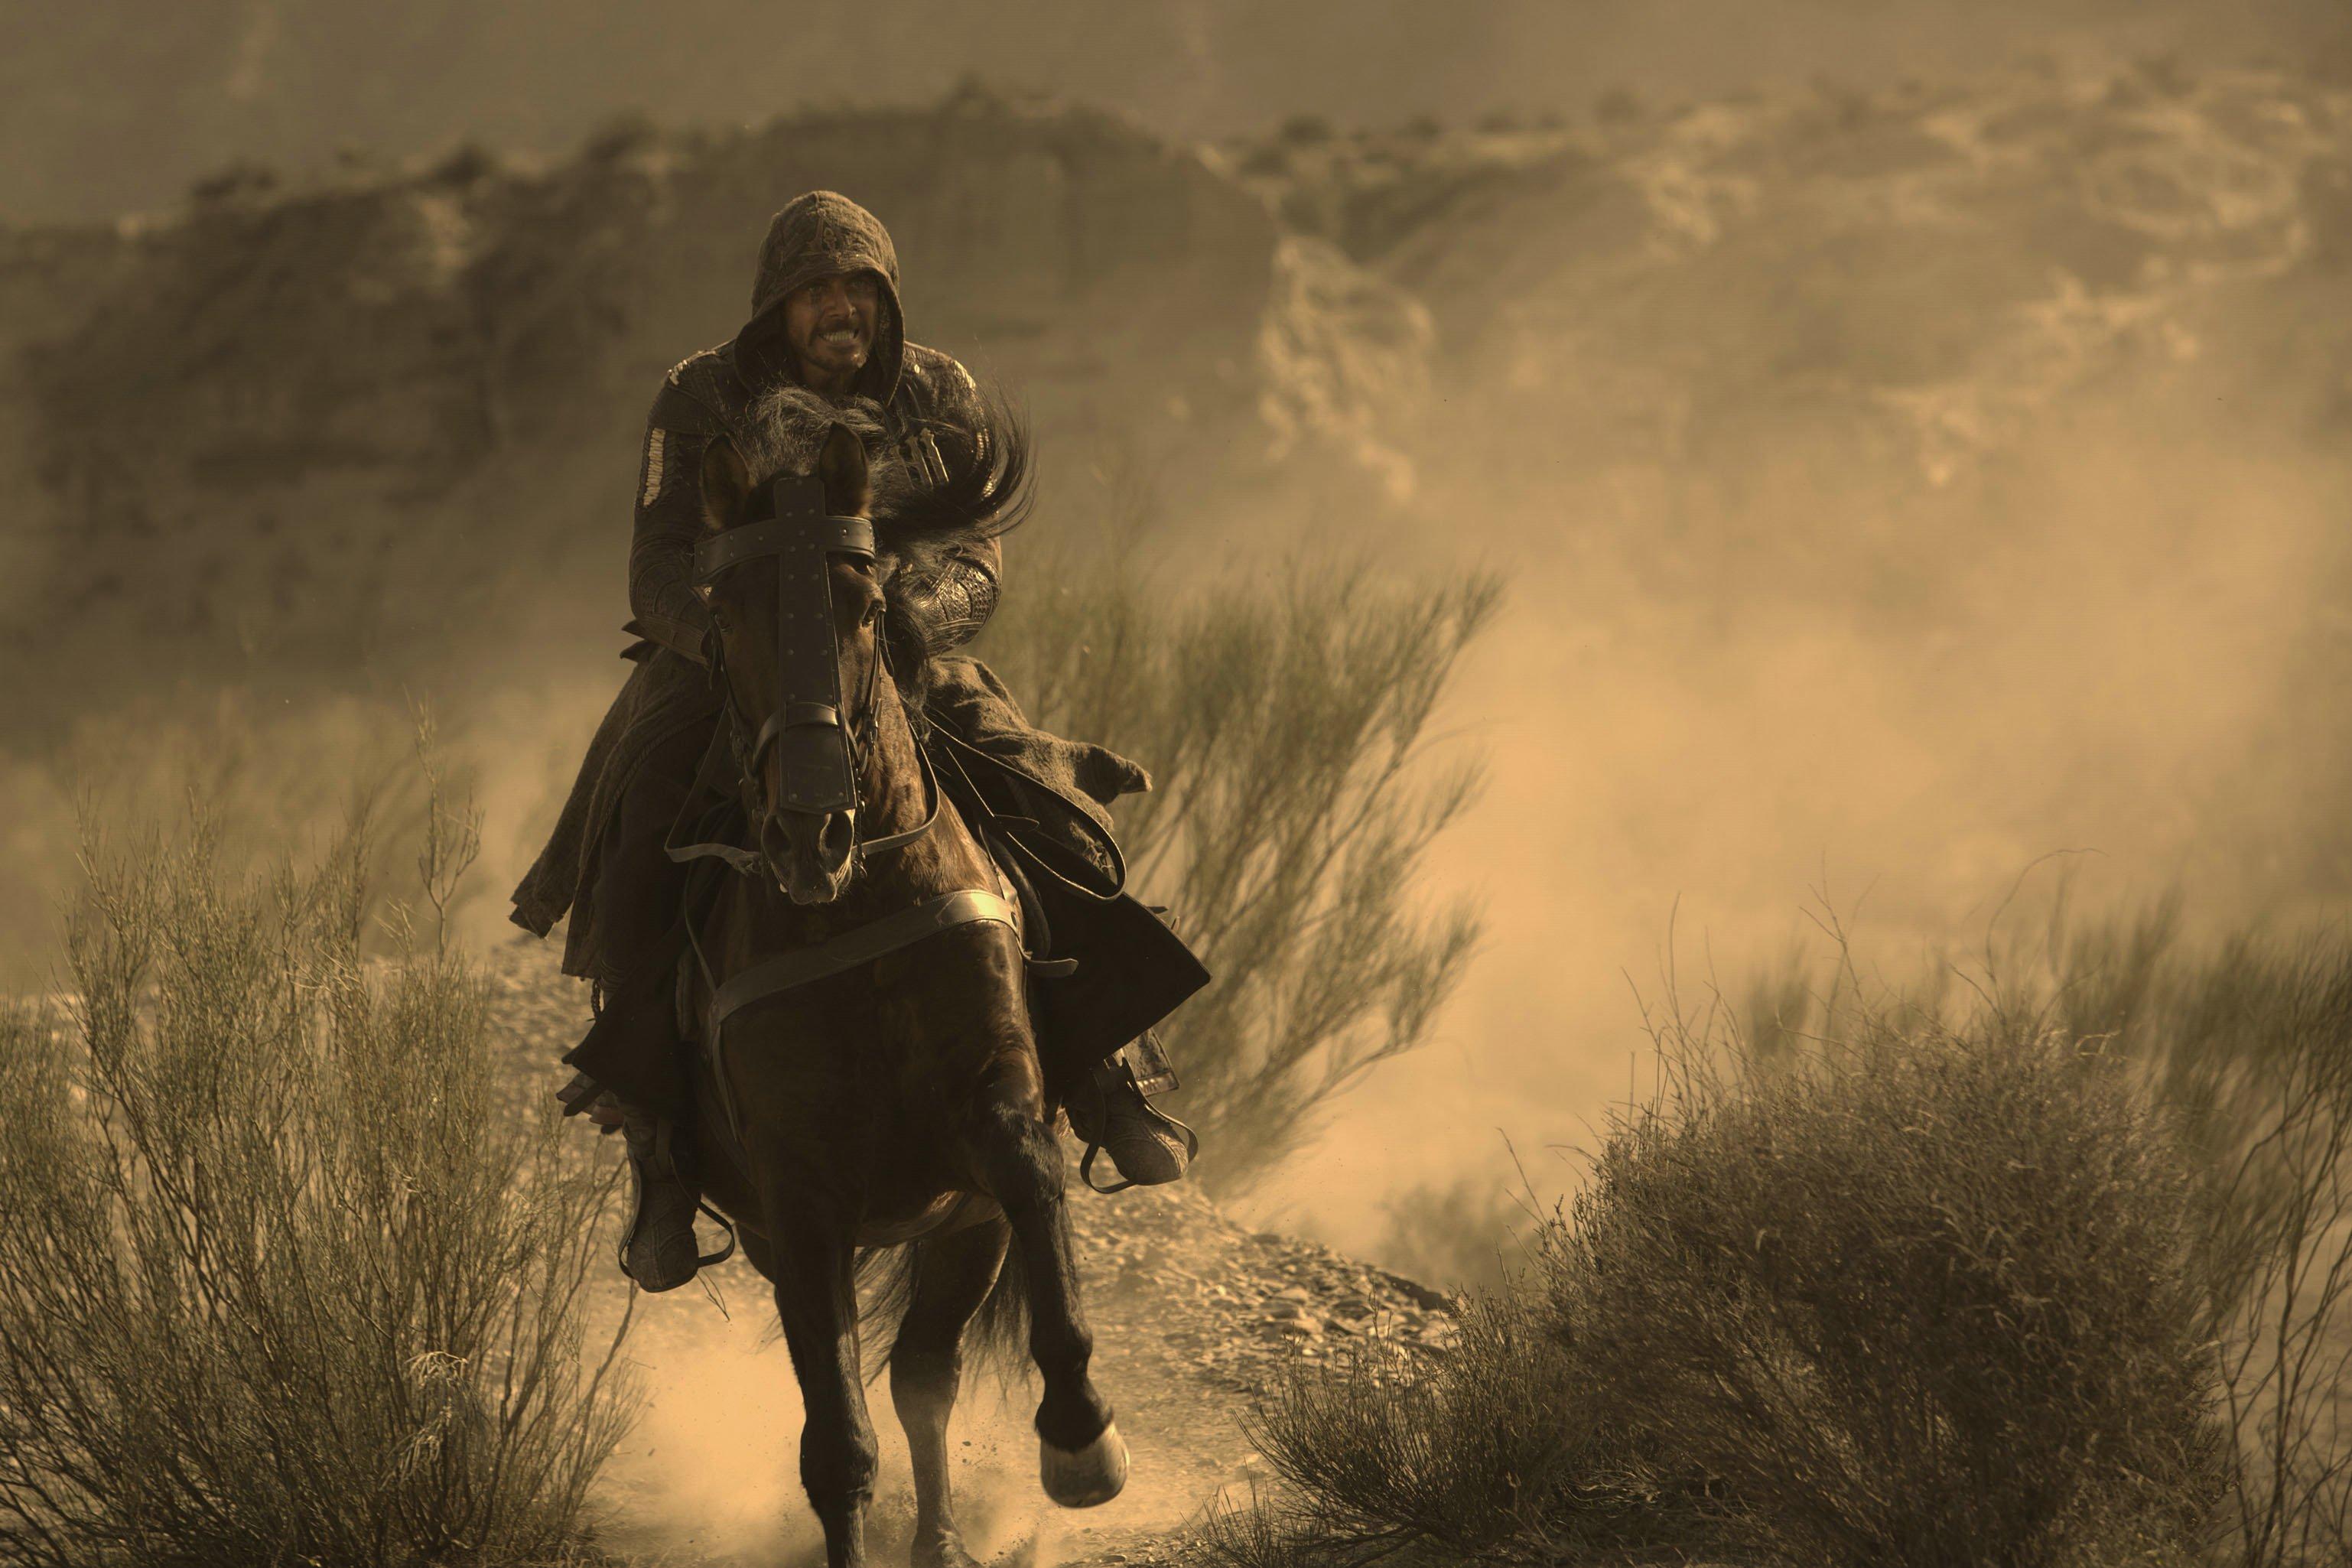 Review - Assassin's Creed - Still 5